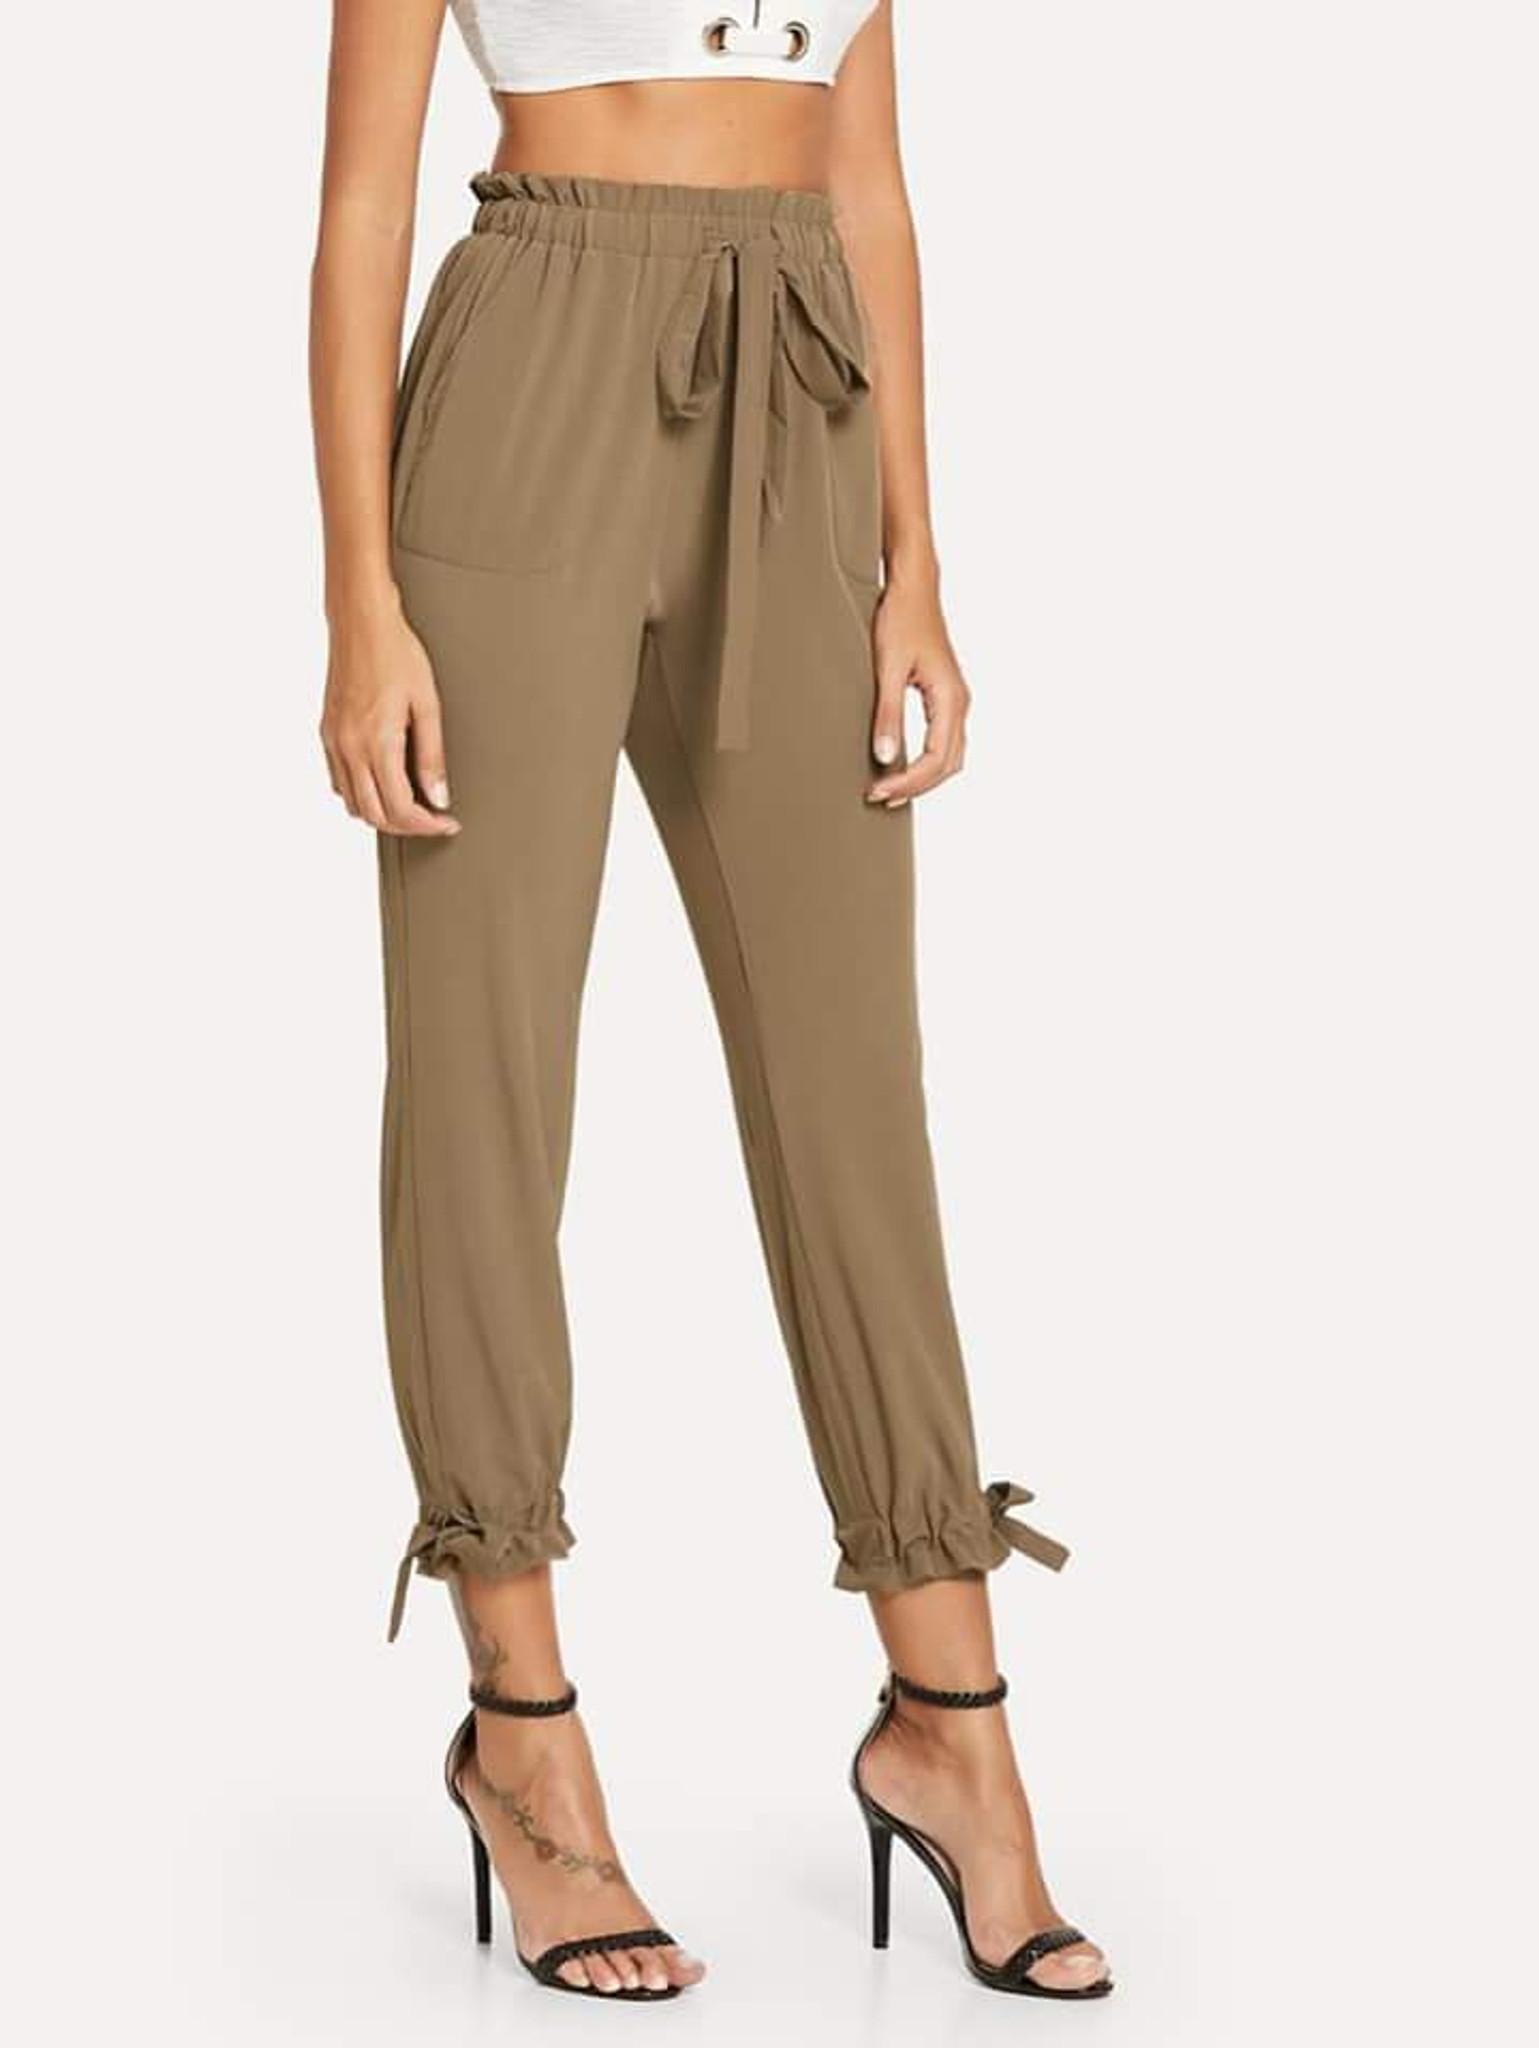 Fifth Avenue Womens HIKK Tie Waist and Elastic Ankle Pants - Brown